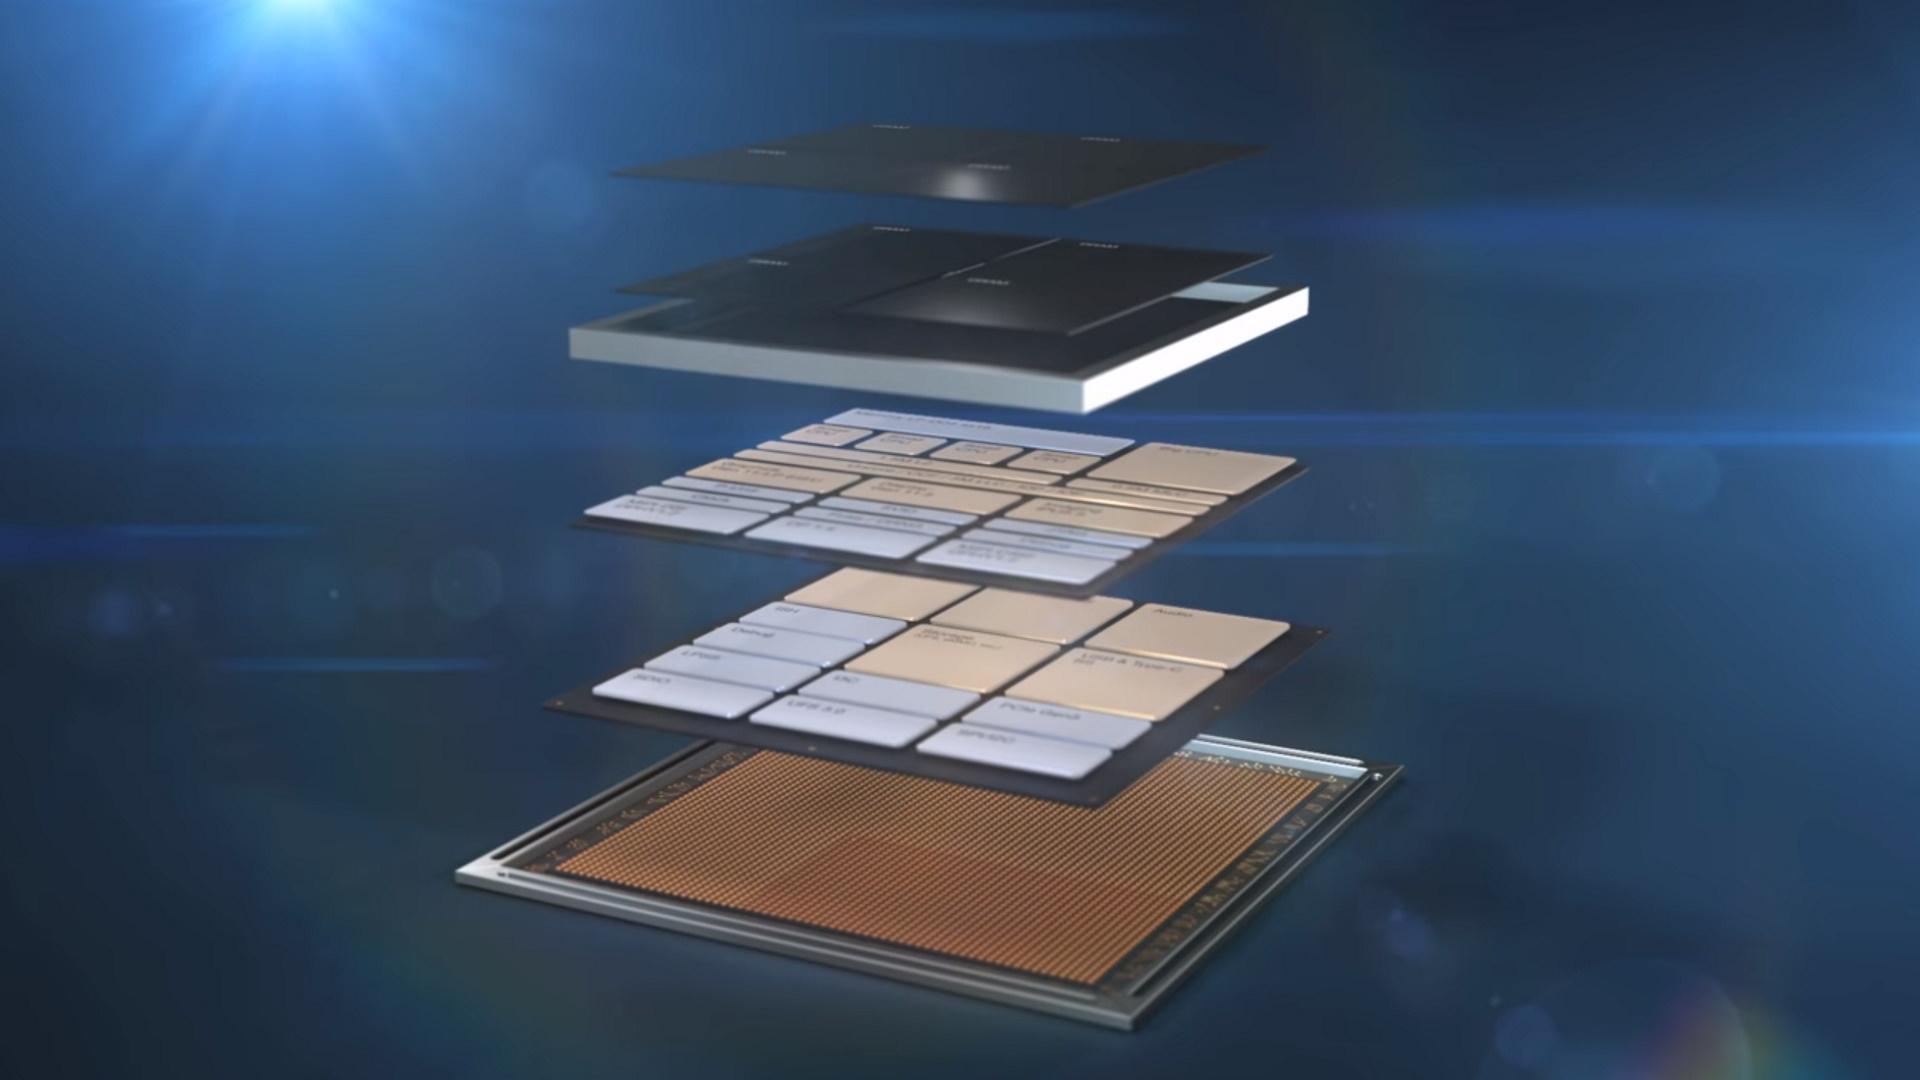 Intel 13th gen CPUs are codenamed Raptor Lake, should follow Alder Lake in 2022